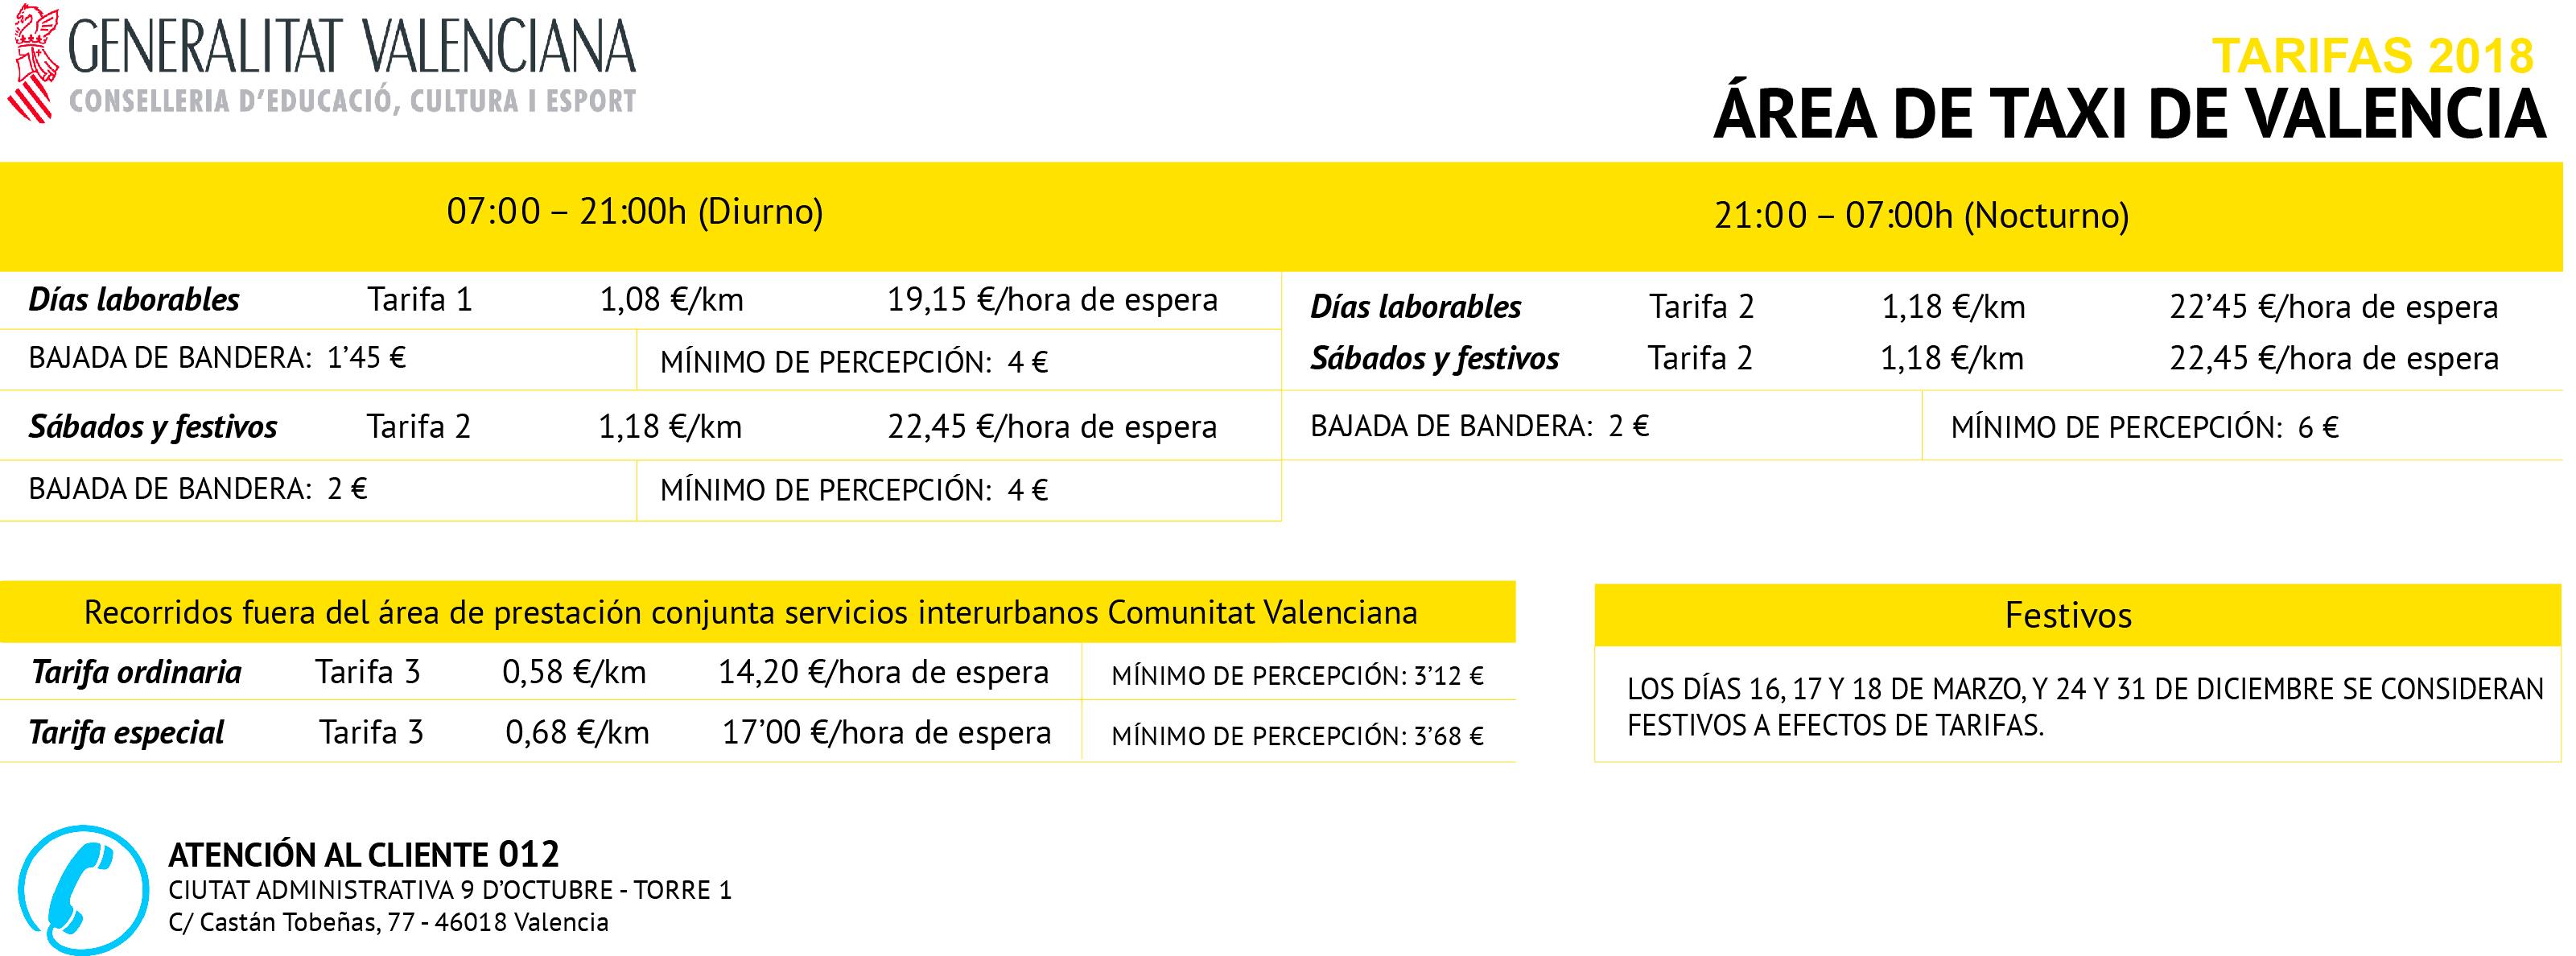 Tele taxi - Tarifes 2016 - Valencià